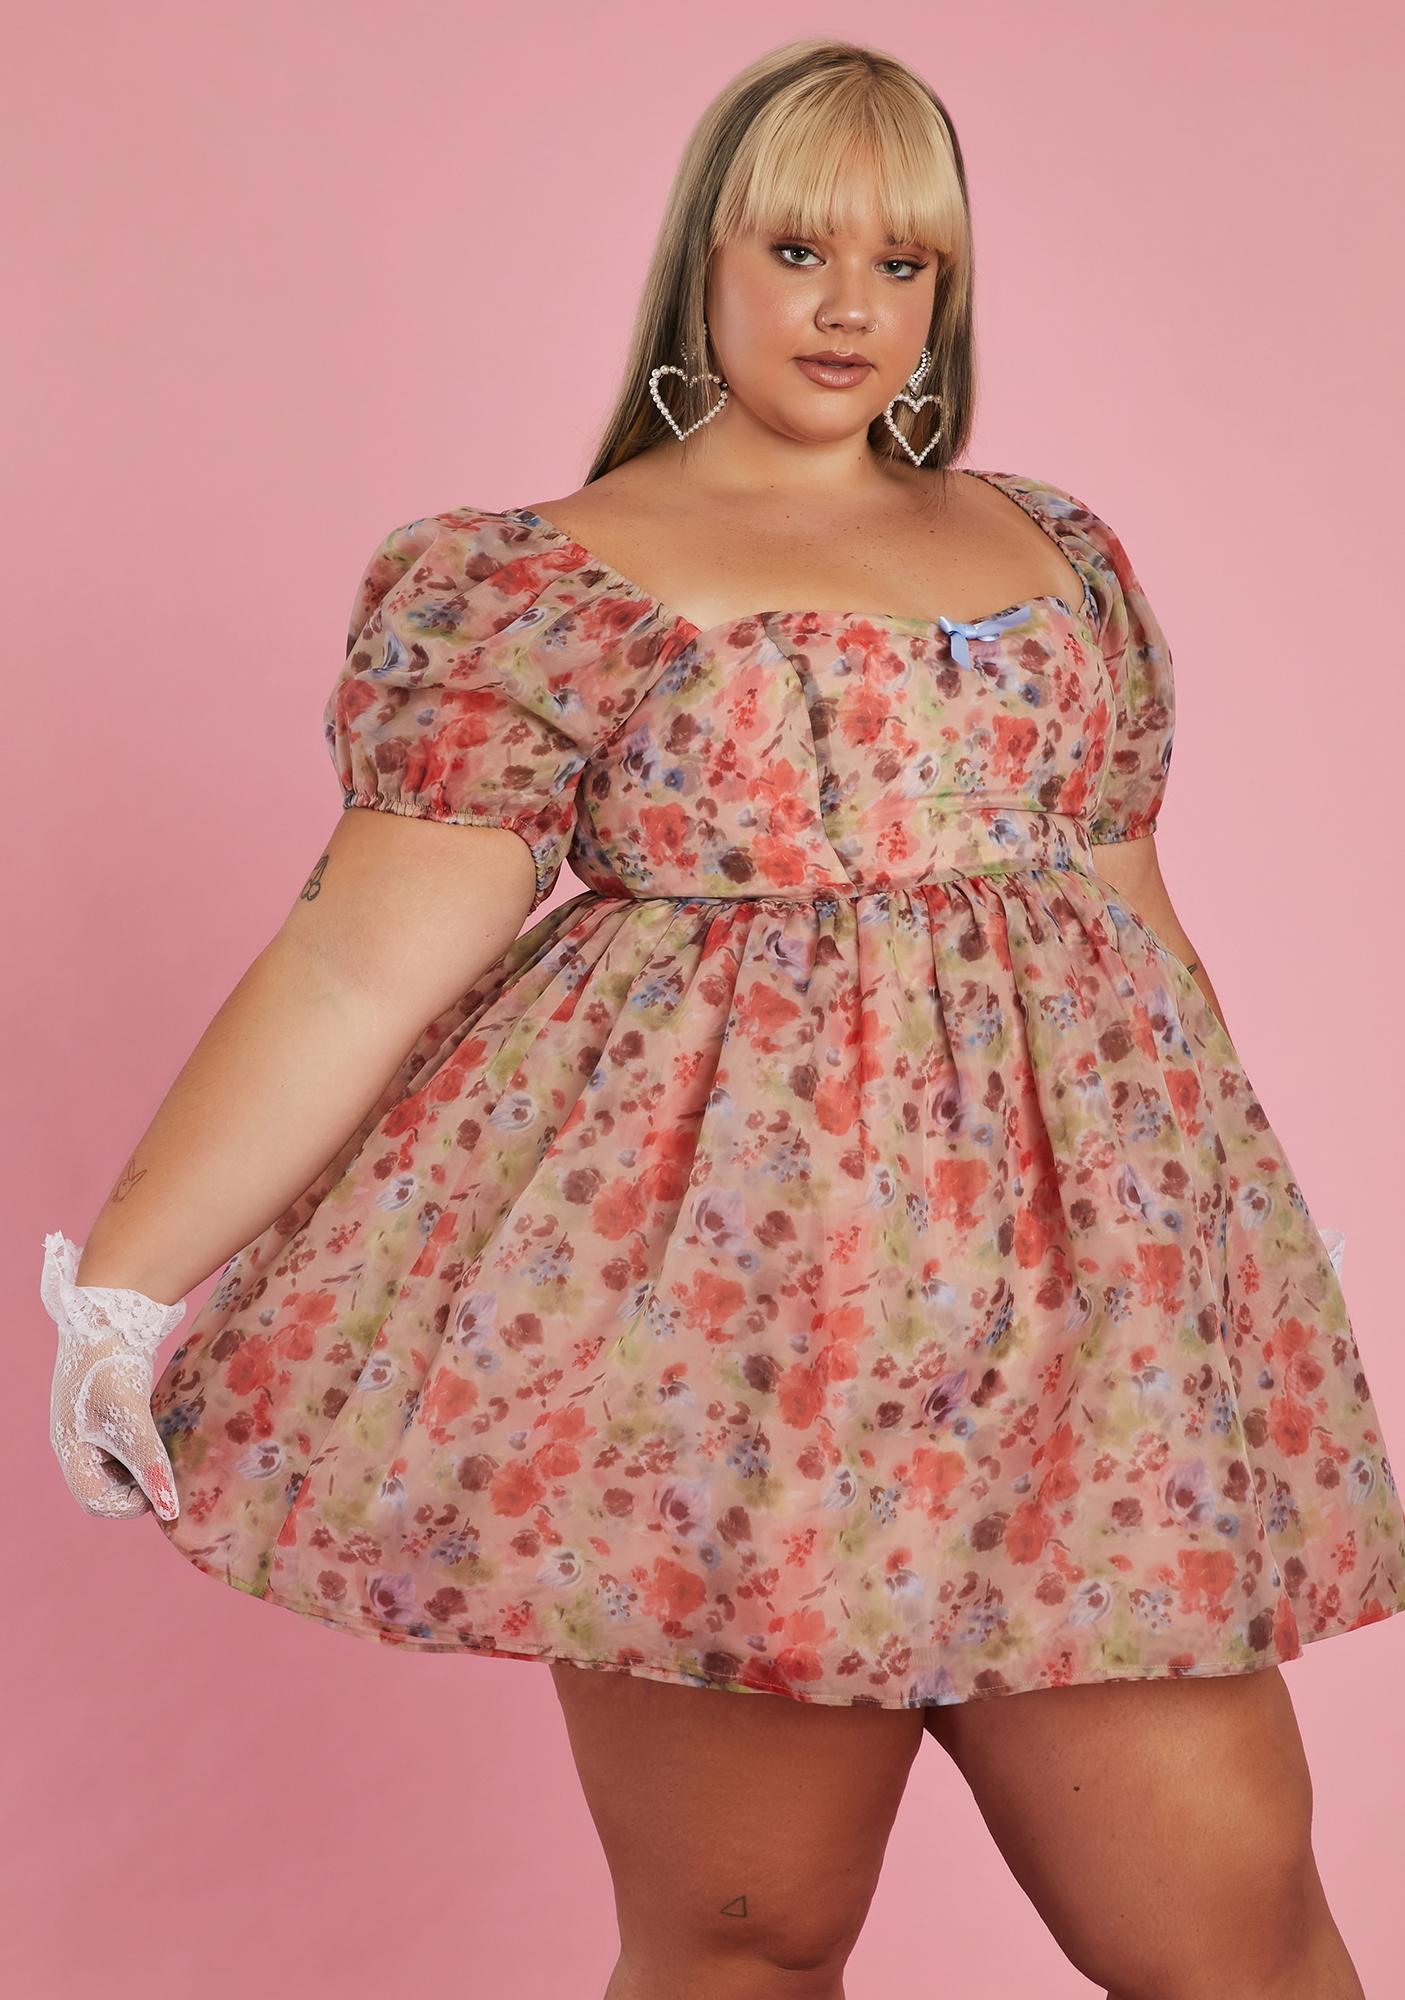 Sugar Thrillz Be My Winding Wheel Babydoll Dress